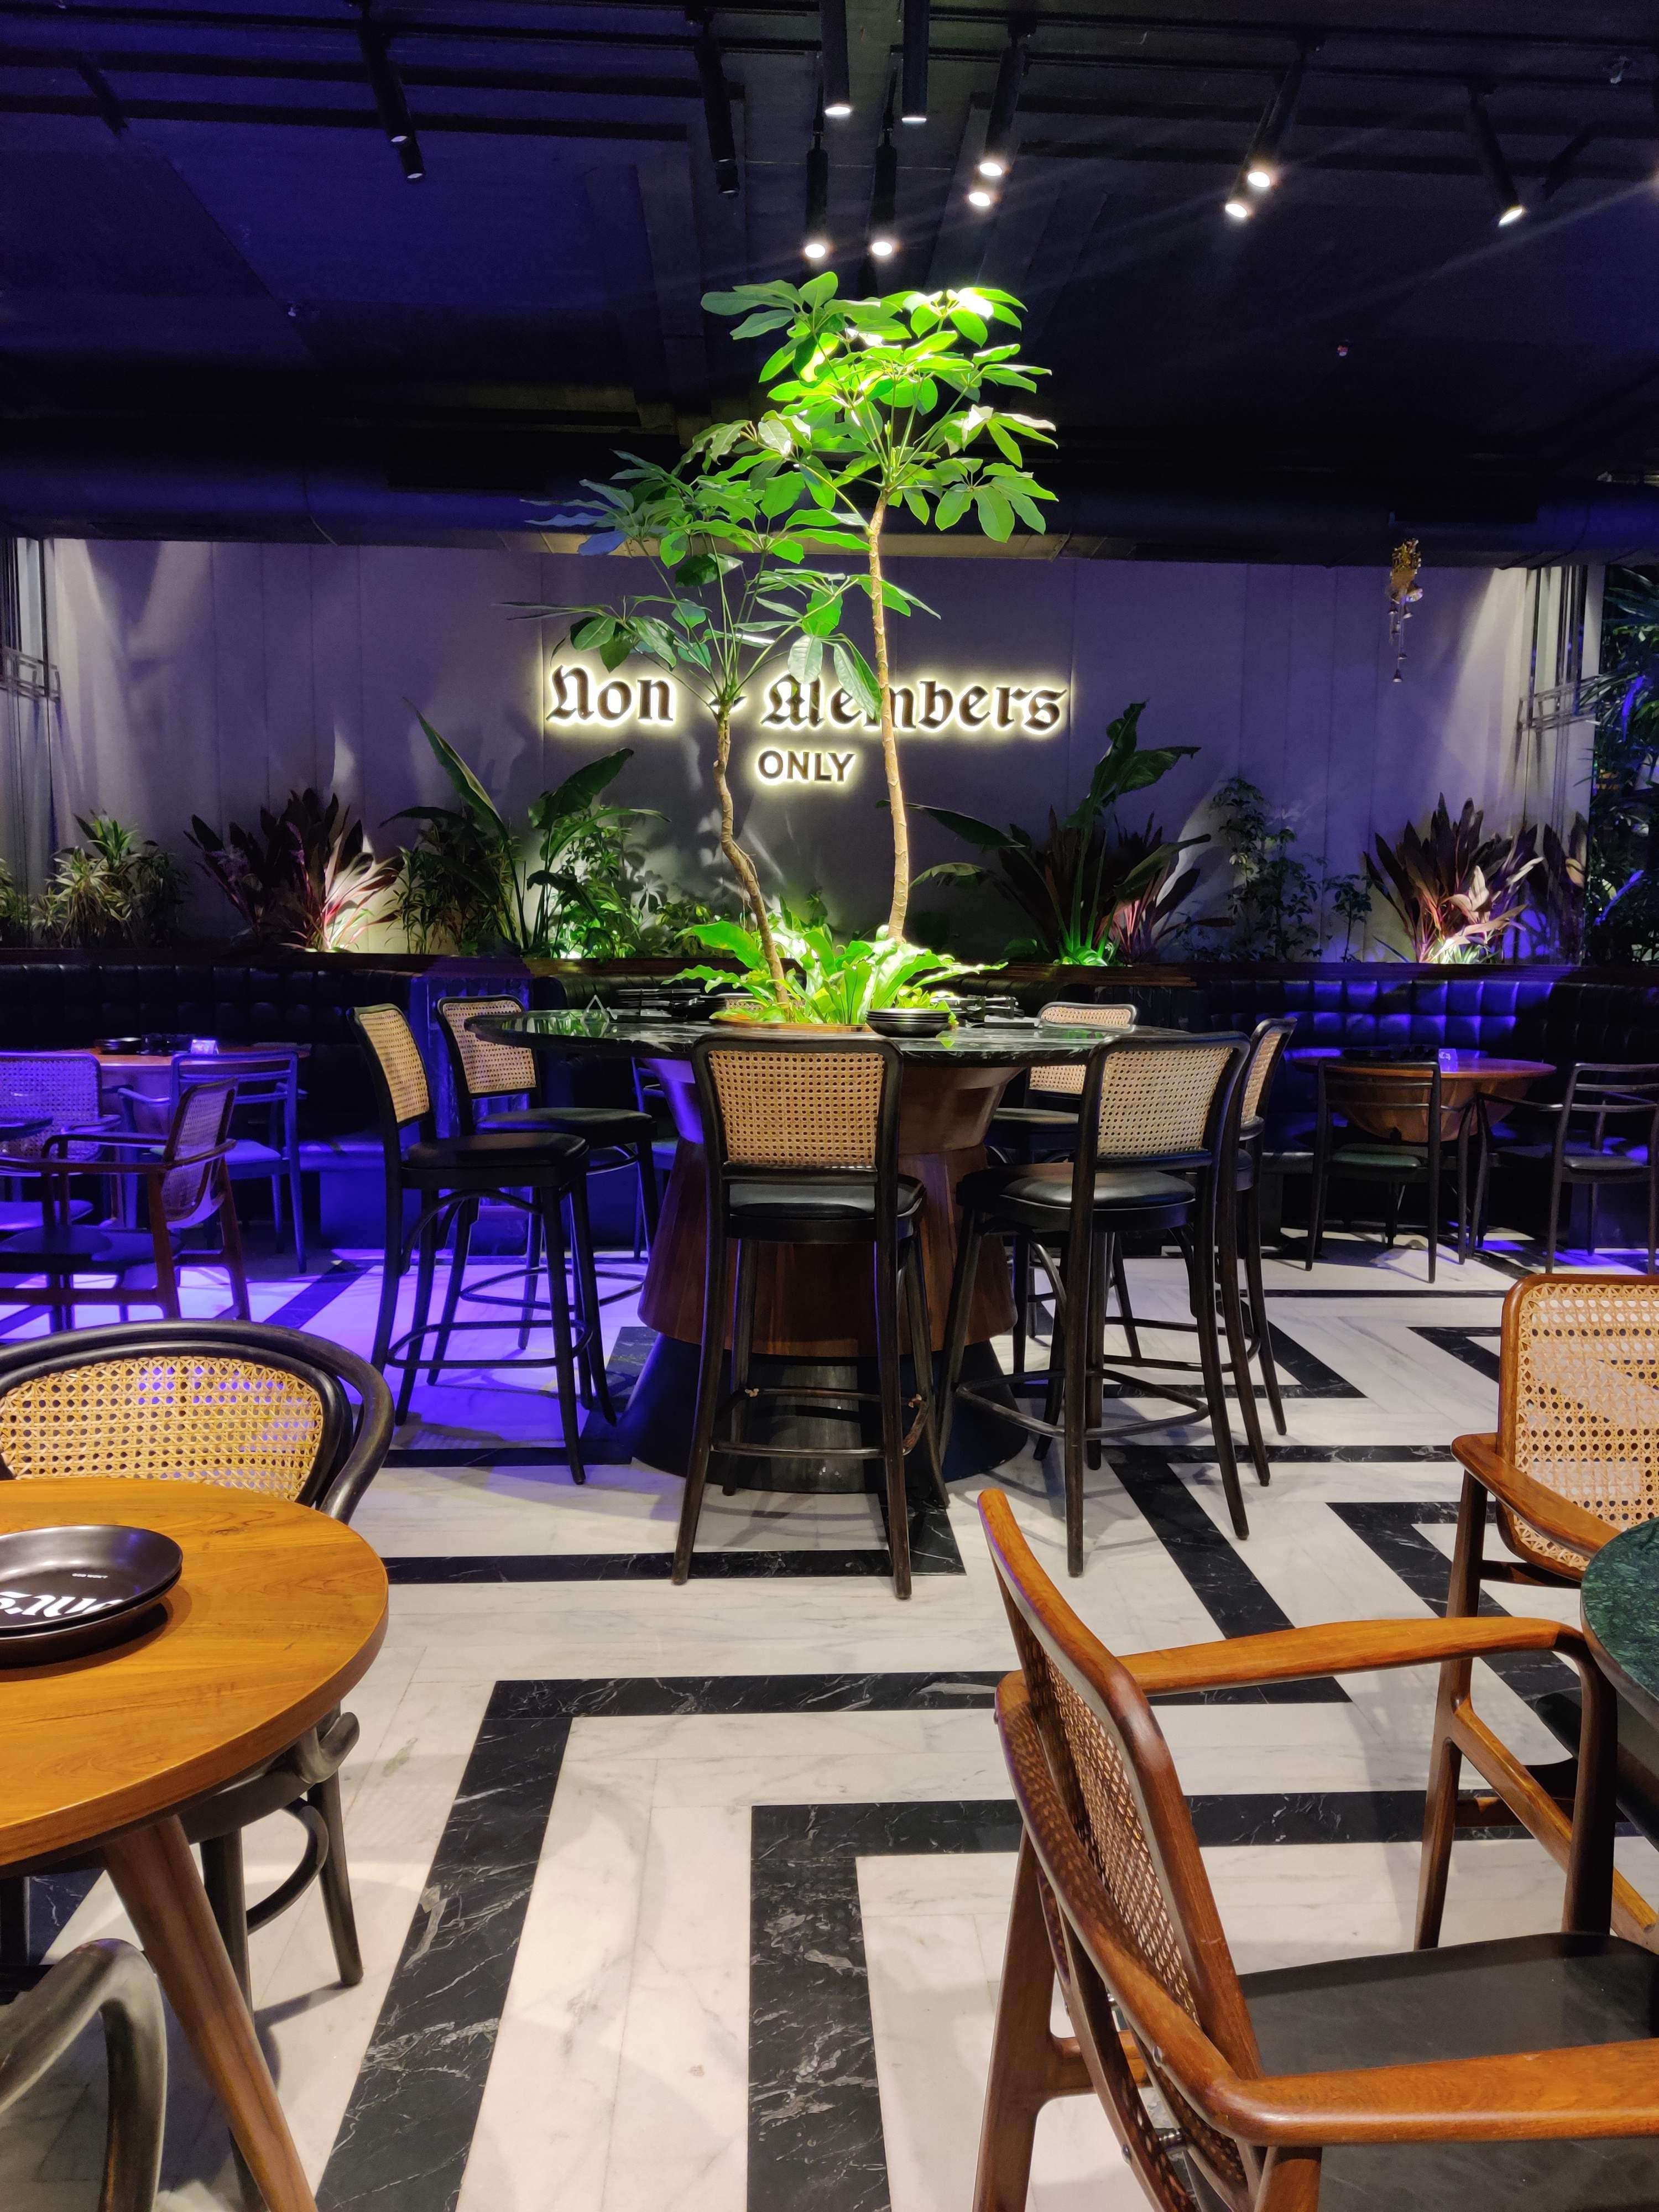 Lighting,Furniture,Table,Houseplant,Tree,Interior design,Patio,Outdoor table,Room,Plant